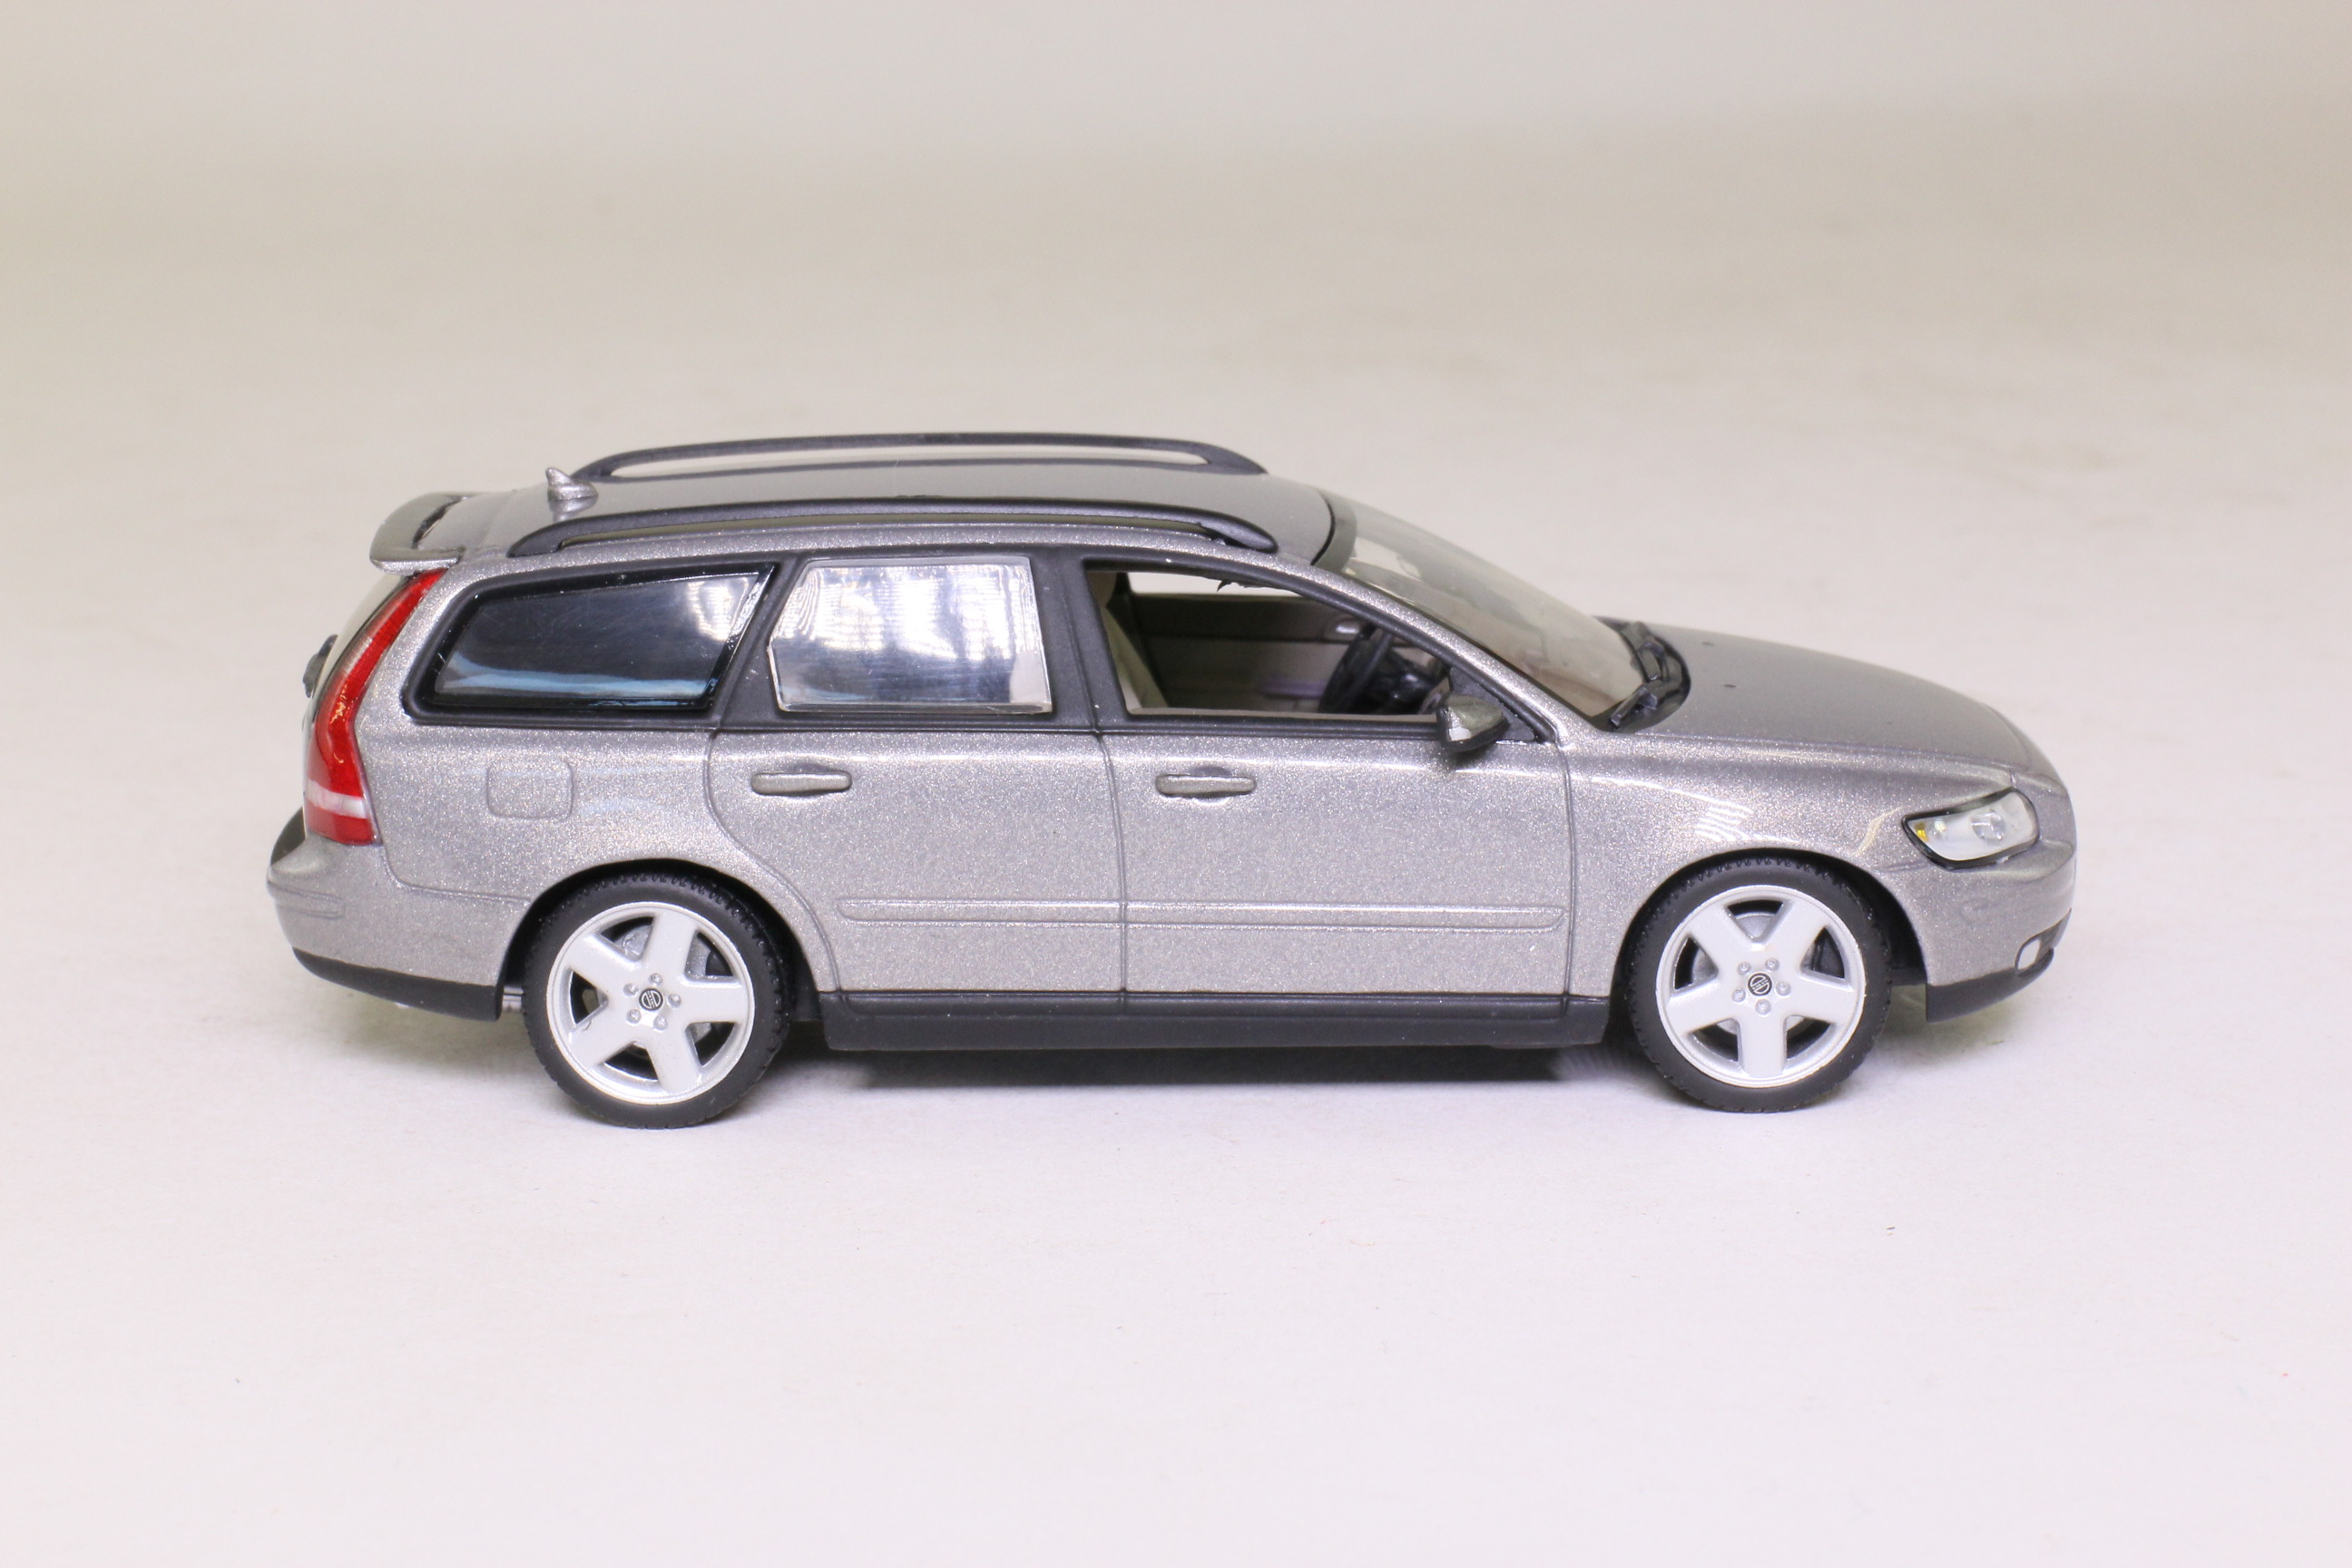 minichamps vfl1095 volvo v50 estate car metallic silver excellent boxed ebay. Black Bedroom Furniture Sets. Home Design Ideas